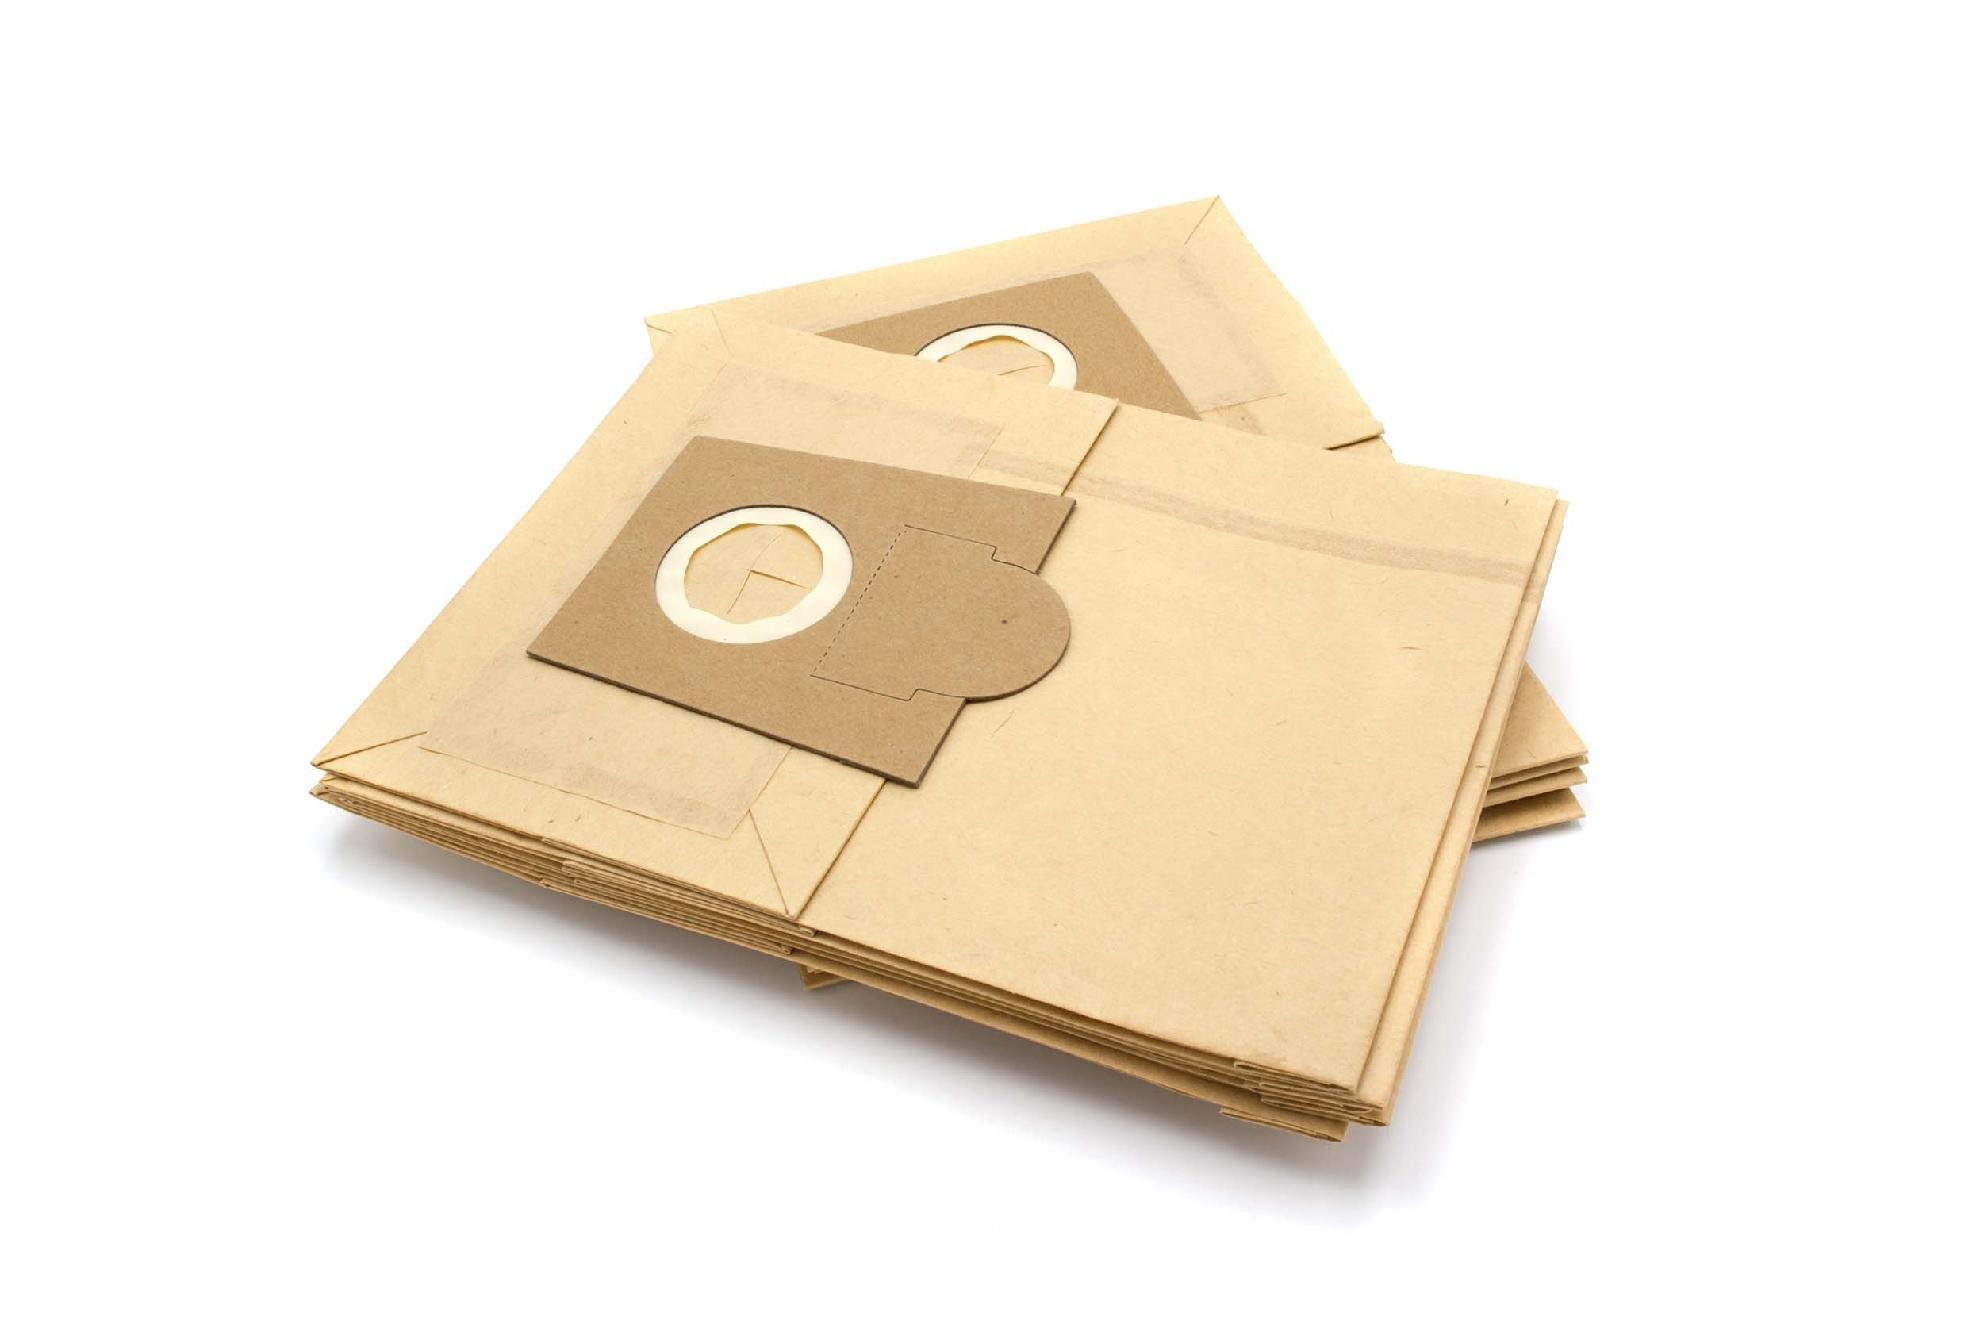 vhbw 10 Bolsas de papel para aspiradoras, limpiador multiusos de ...